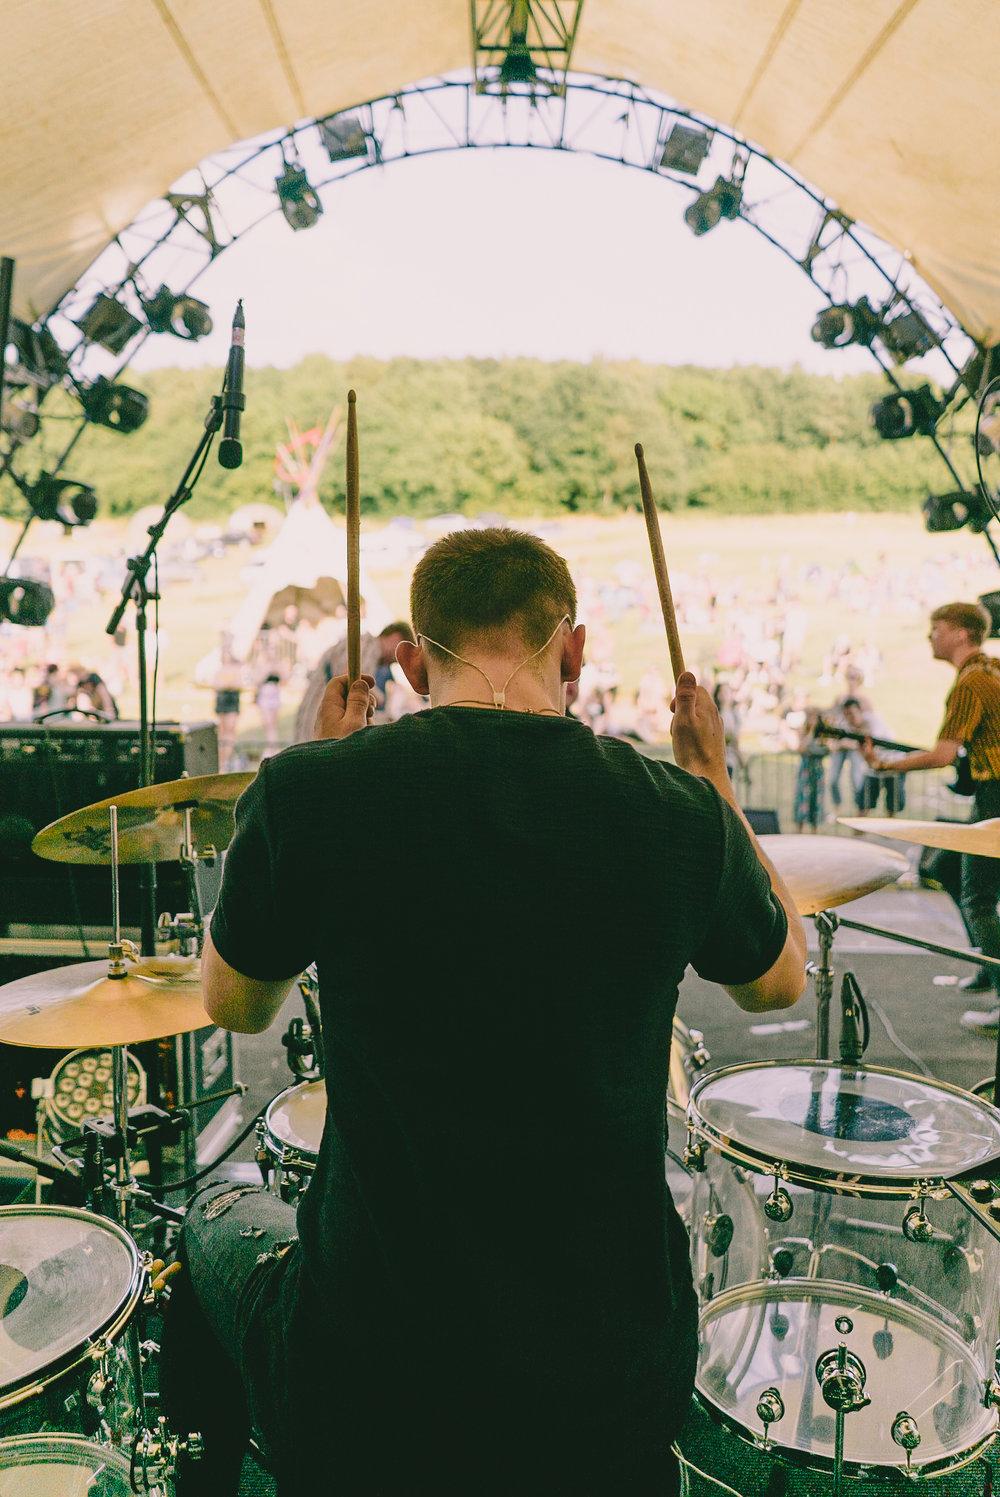 ASHFIELDS at Wellow Festival, Newark 14.7